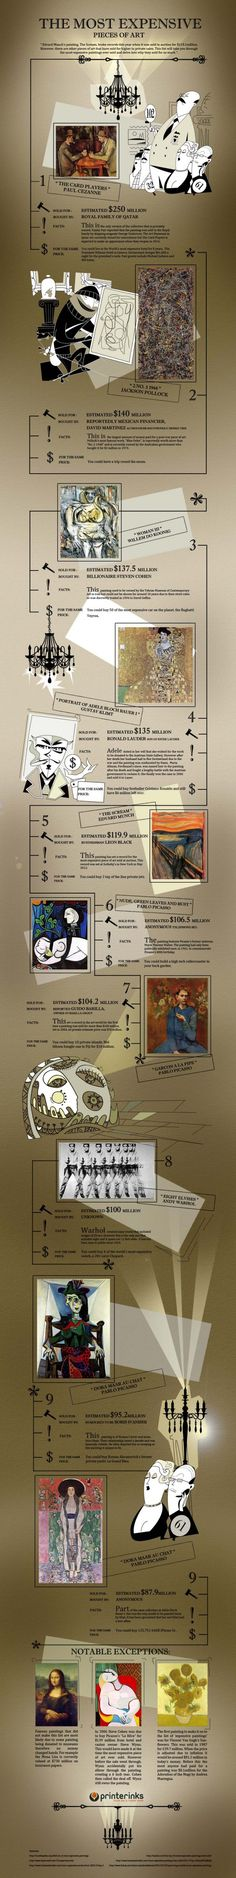 Infographic art history